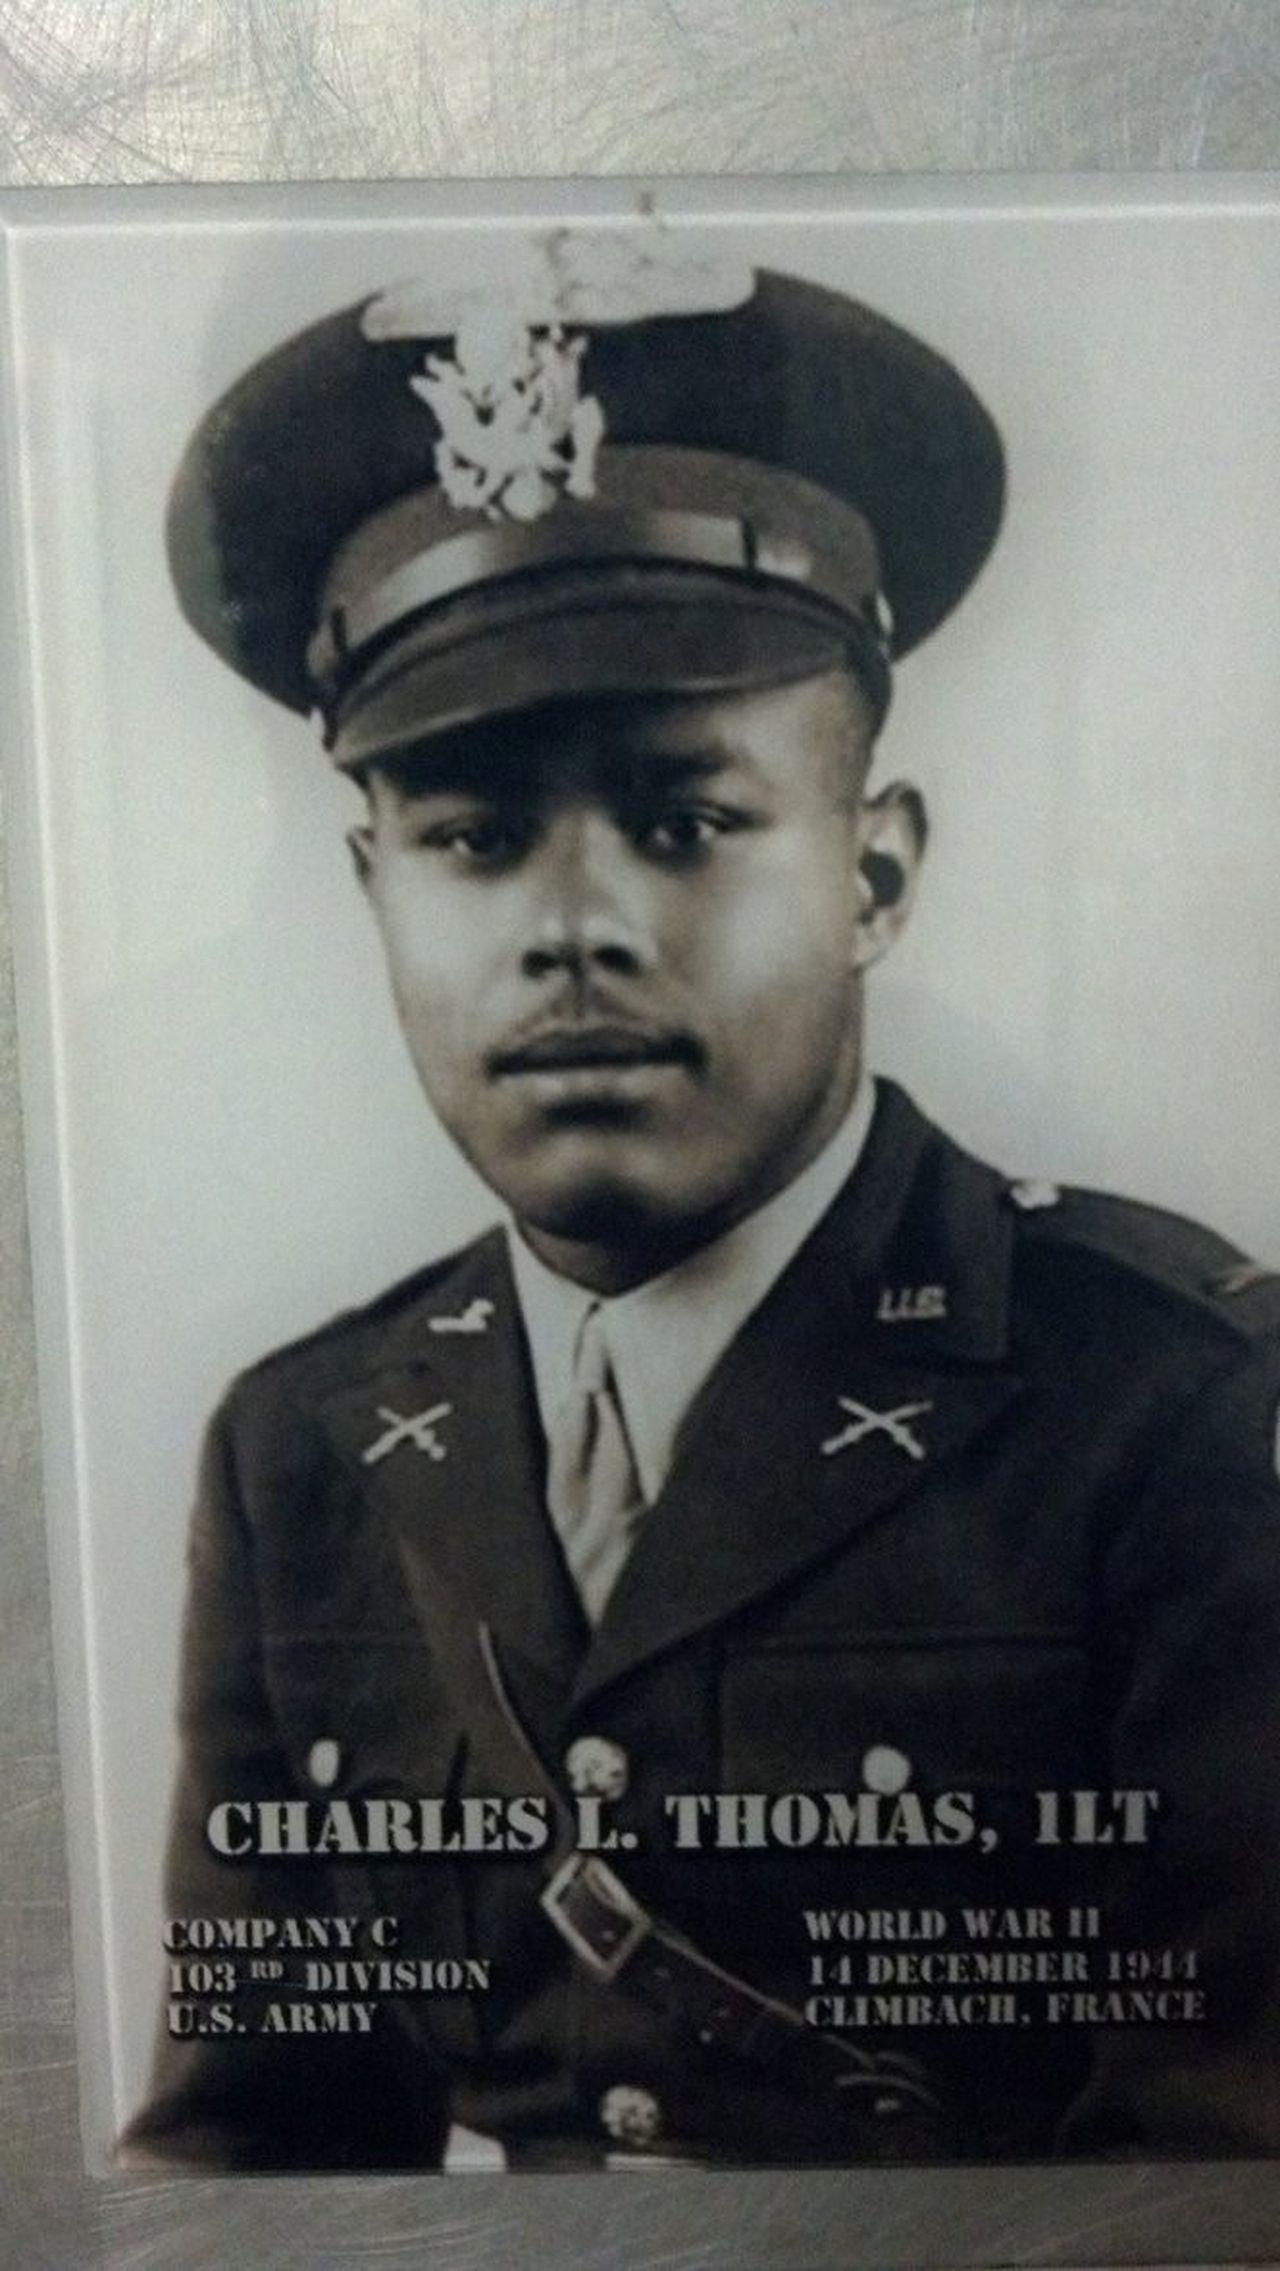 Major Charles L. Thomas